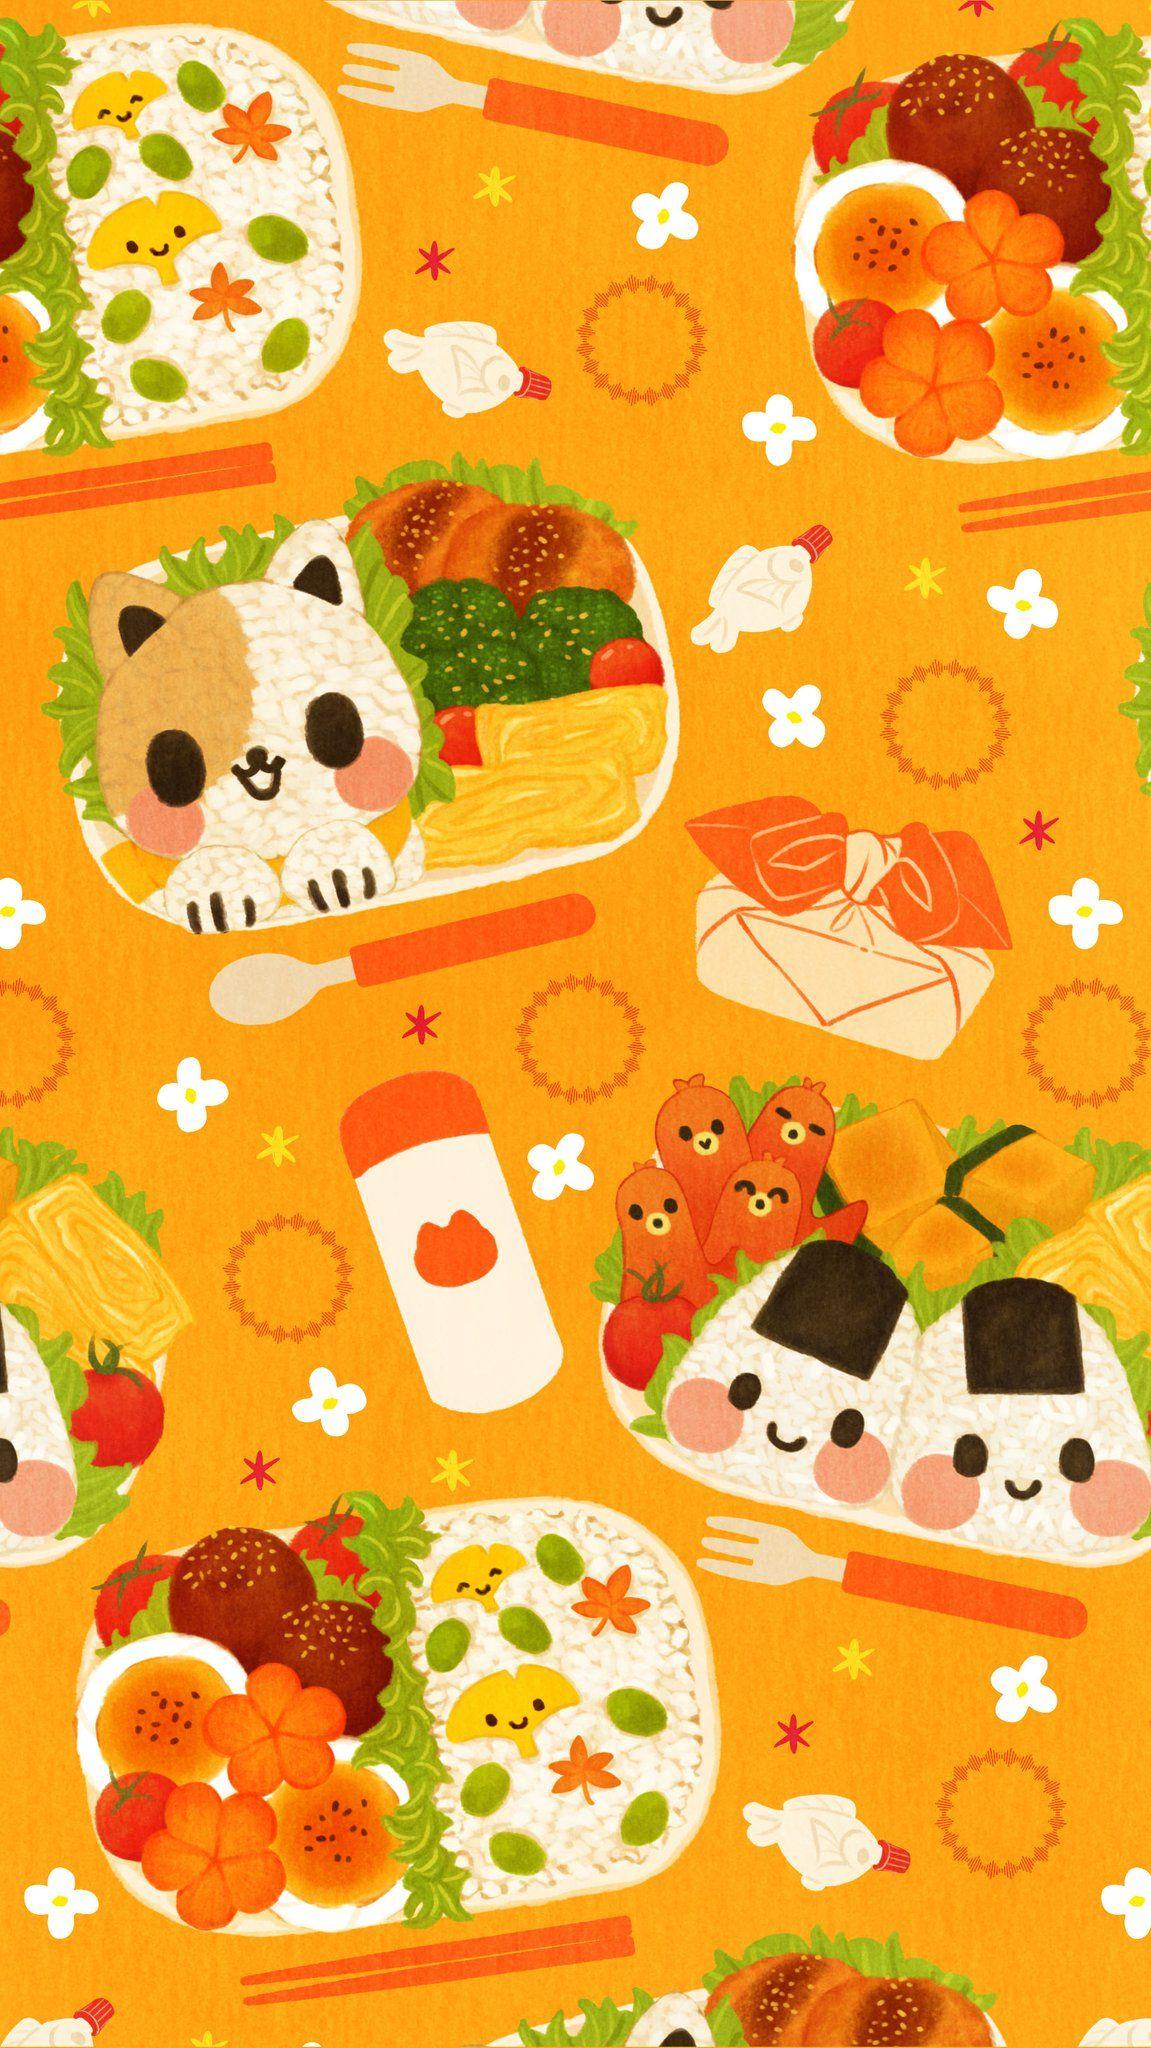 Omiyu みゆき On 2020 お弁当 イラスト 食べ物 イラスト イラスト